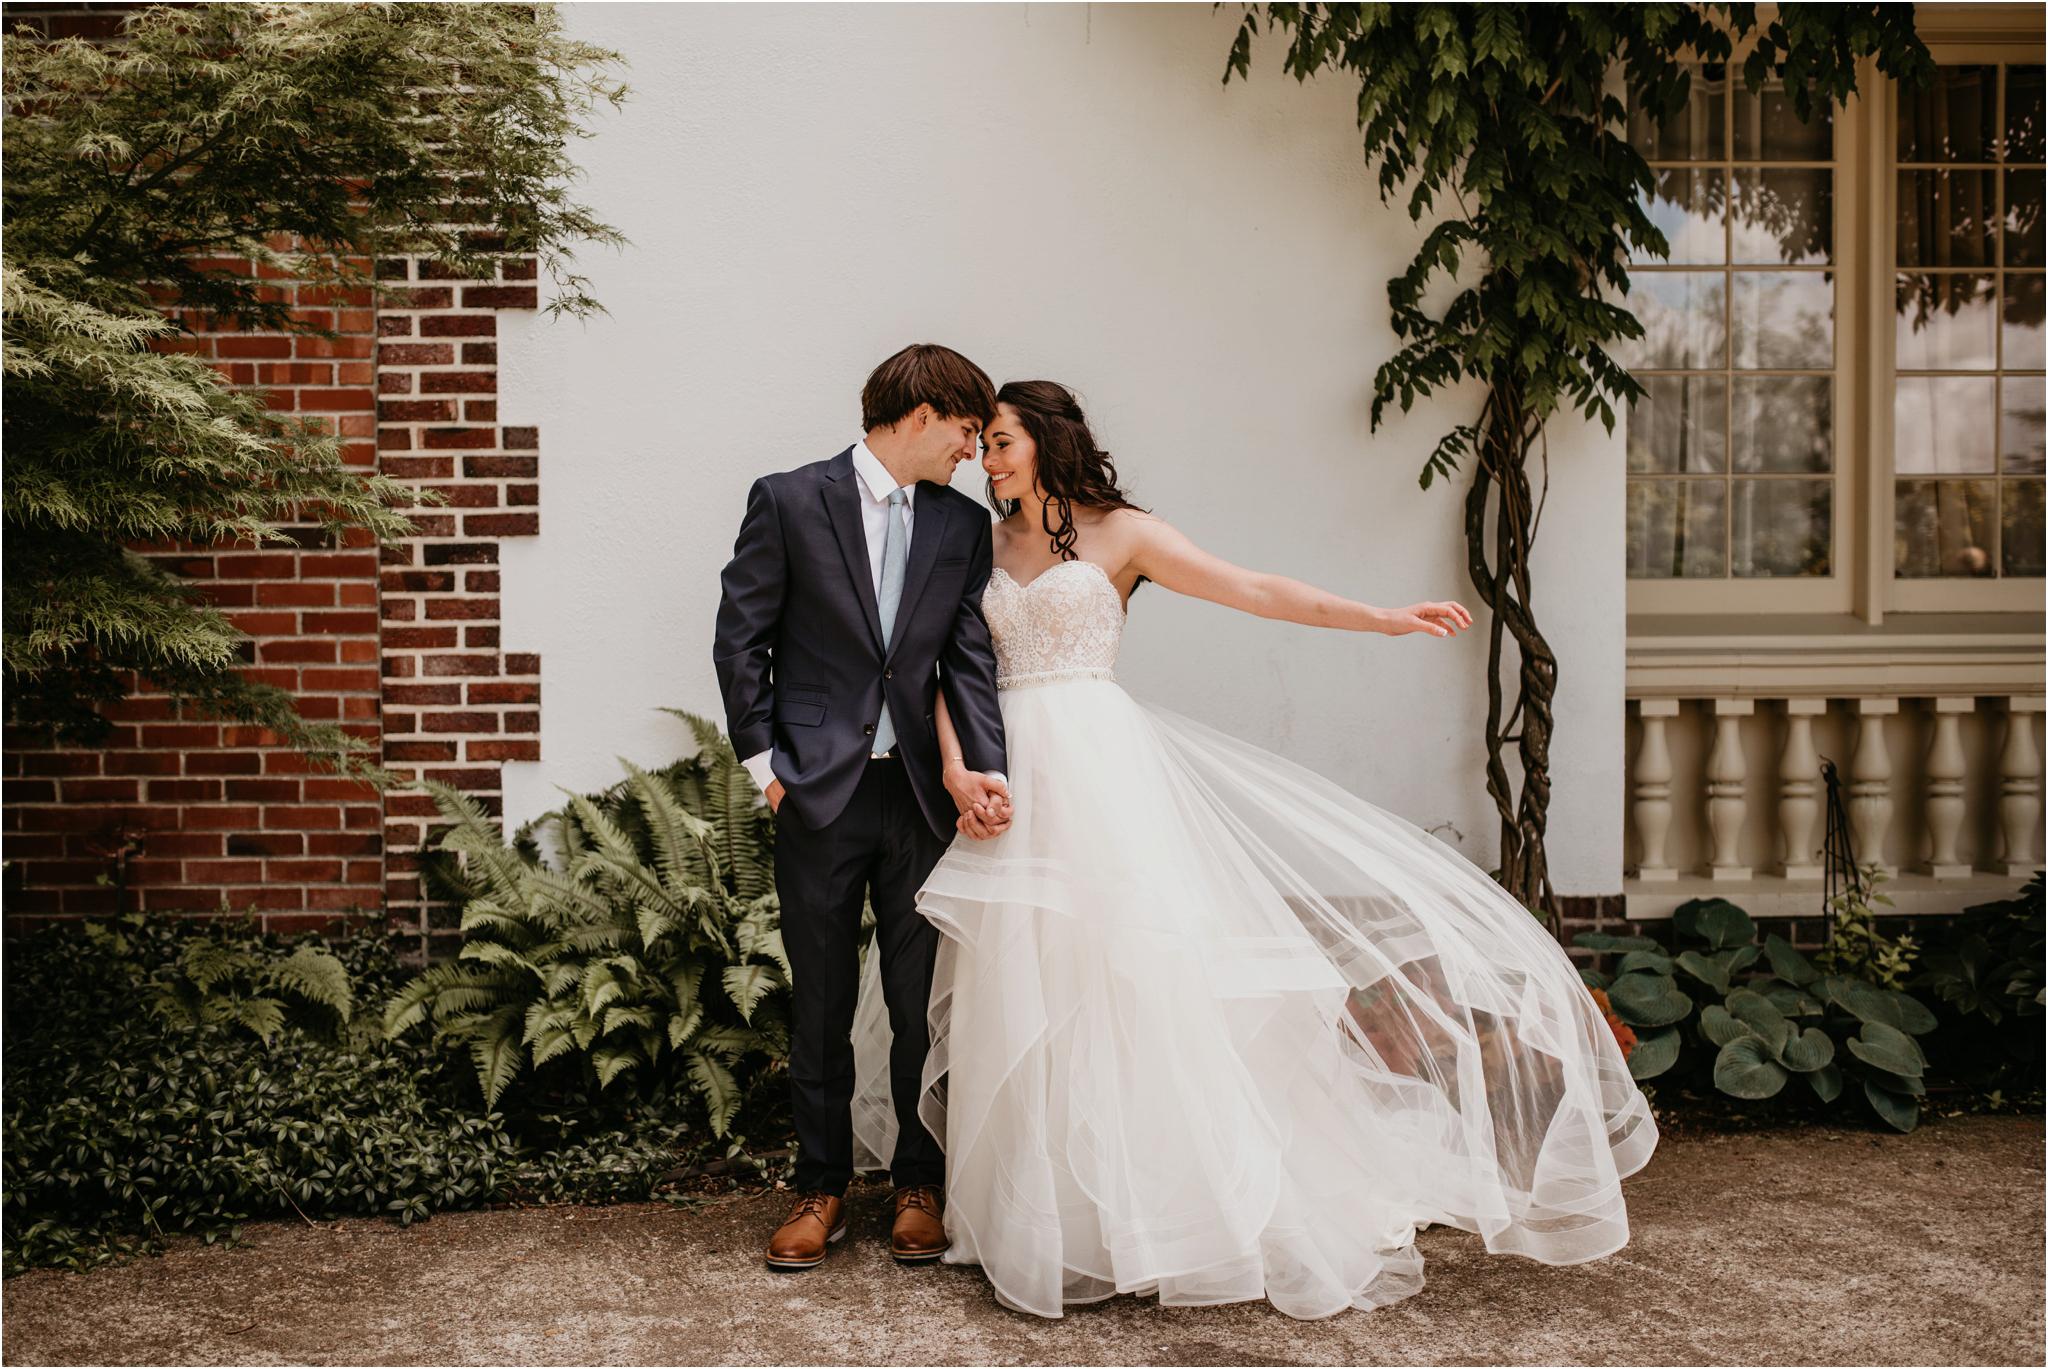 chance-and-ondrea-lairmont-manor-wedding-seattle-photographer-043.jpg